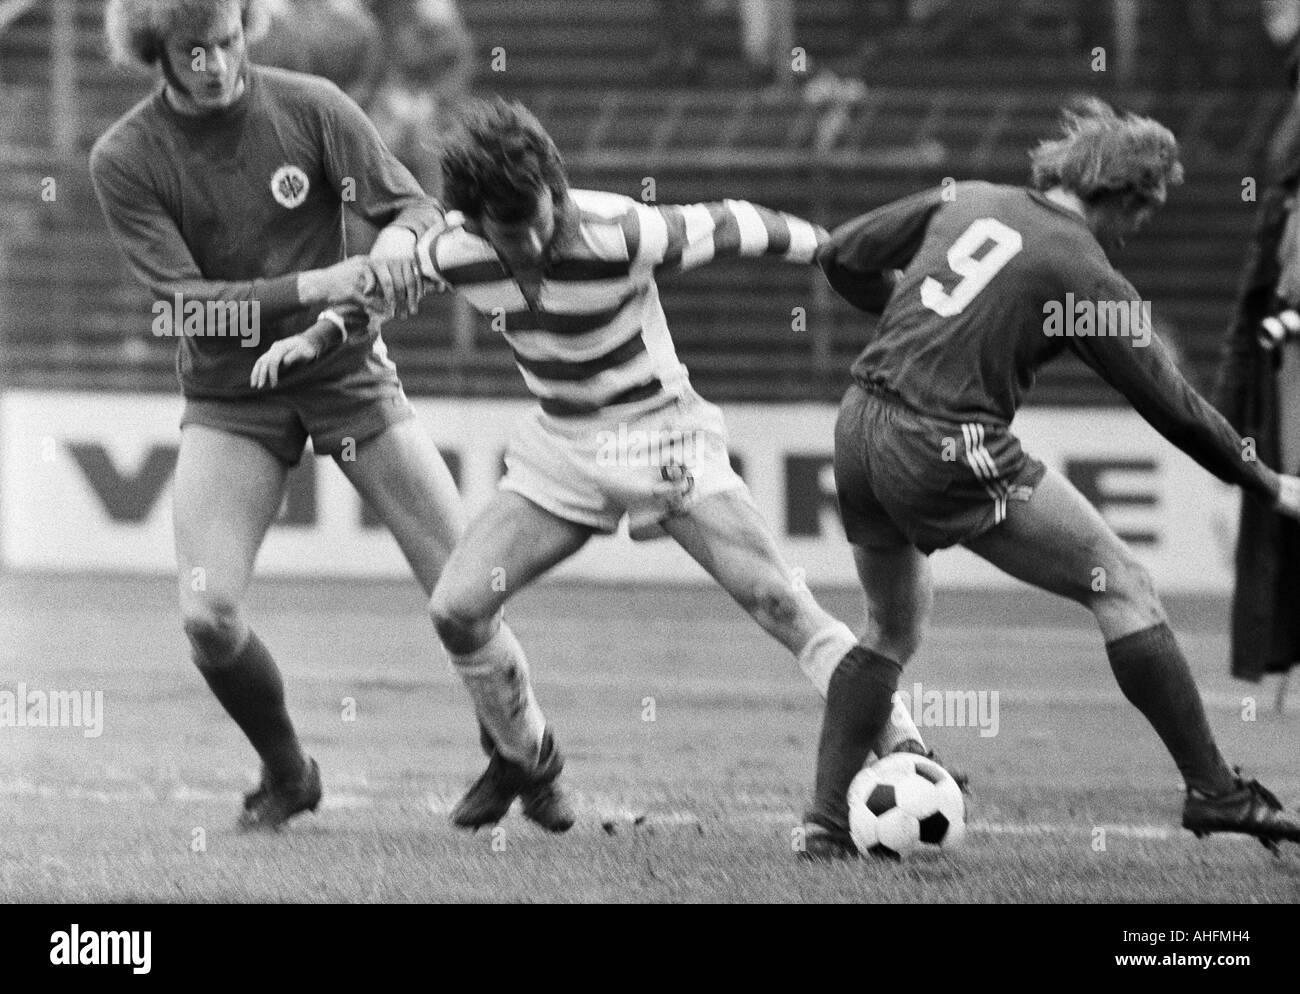 football, Bundesliga, 1971/1972, Wedau Stadium in Duisburg, MSV Duisburg versus Rot-Weiss Oberhausen 0:0, scene of the match, f.l.t.r. Uwe Kliemann (RWO), Klaus Wunder (MSV), Jupp Tenhagen (RWO) - Stock Image